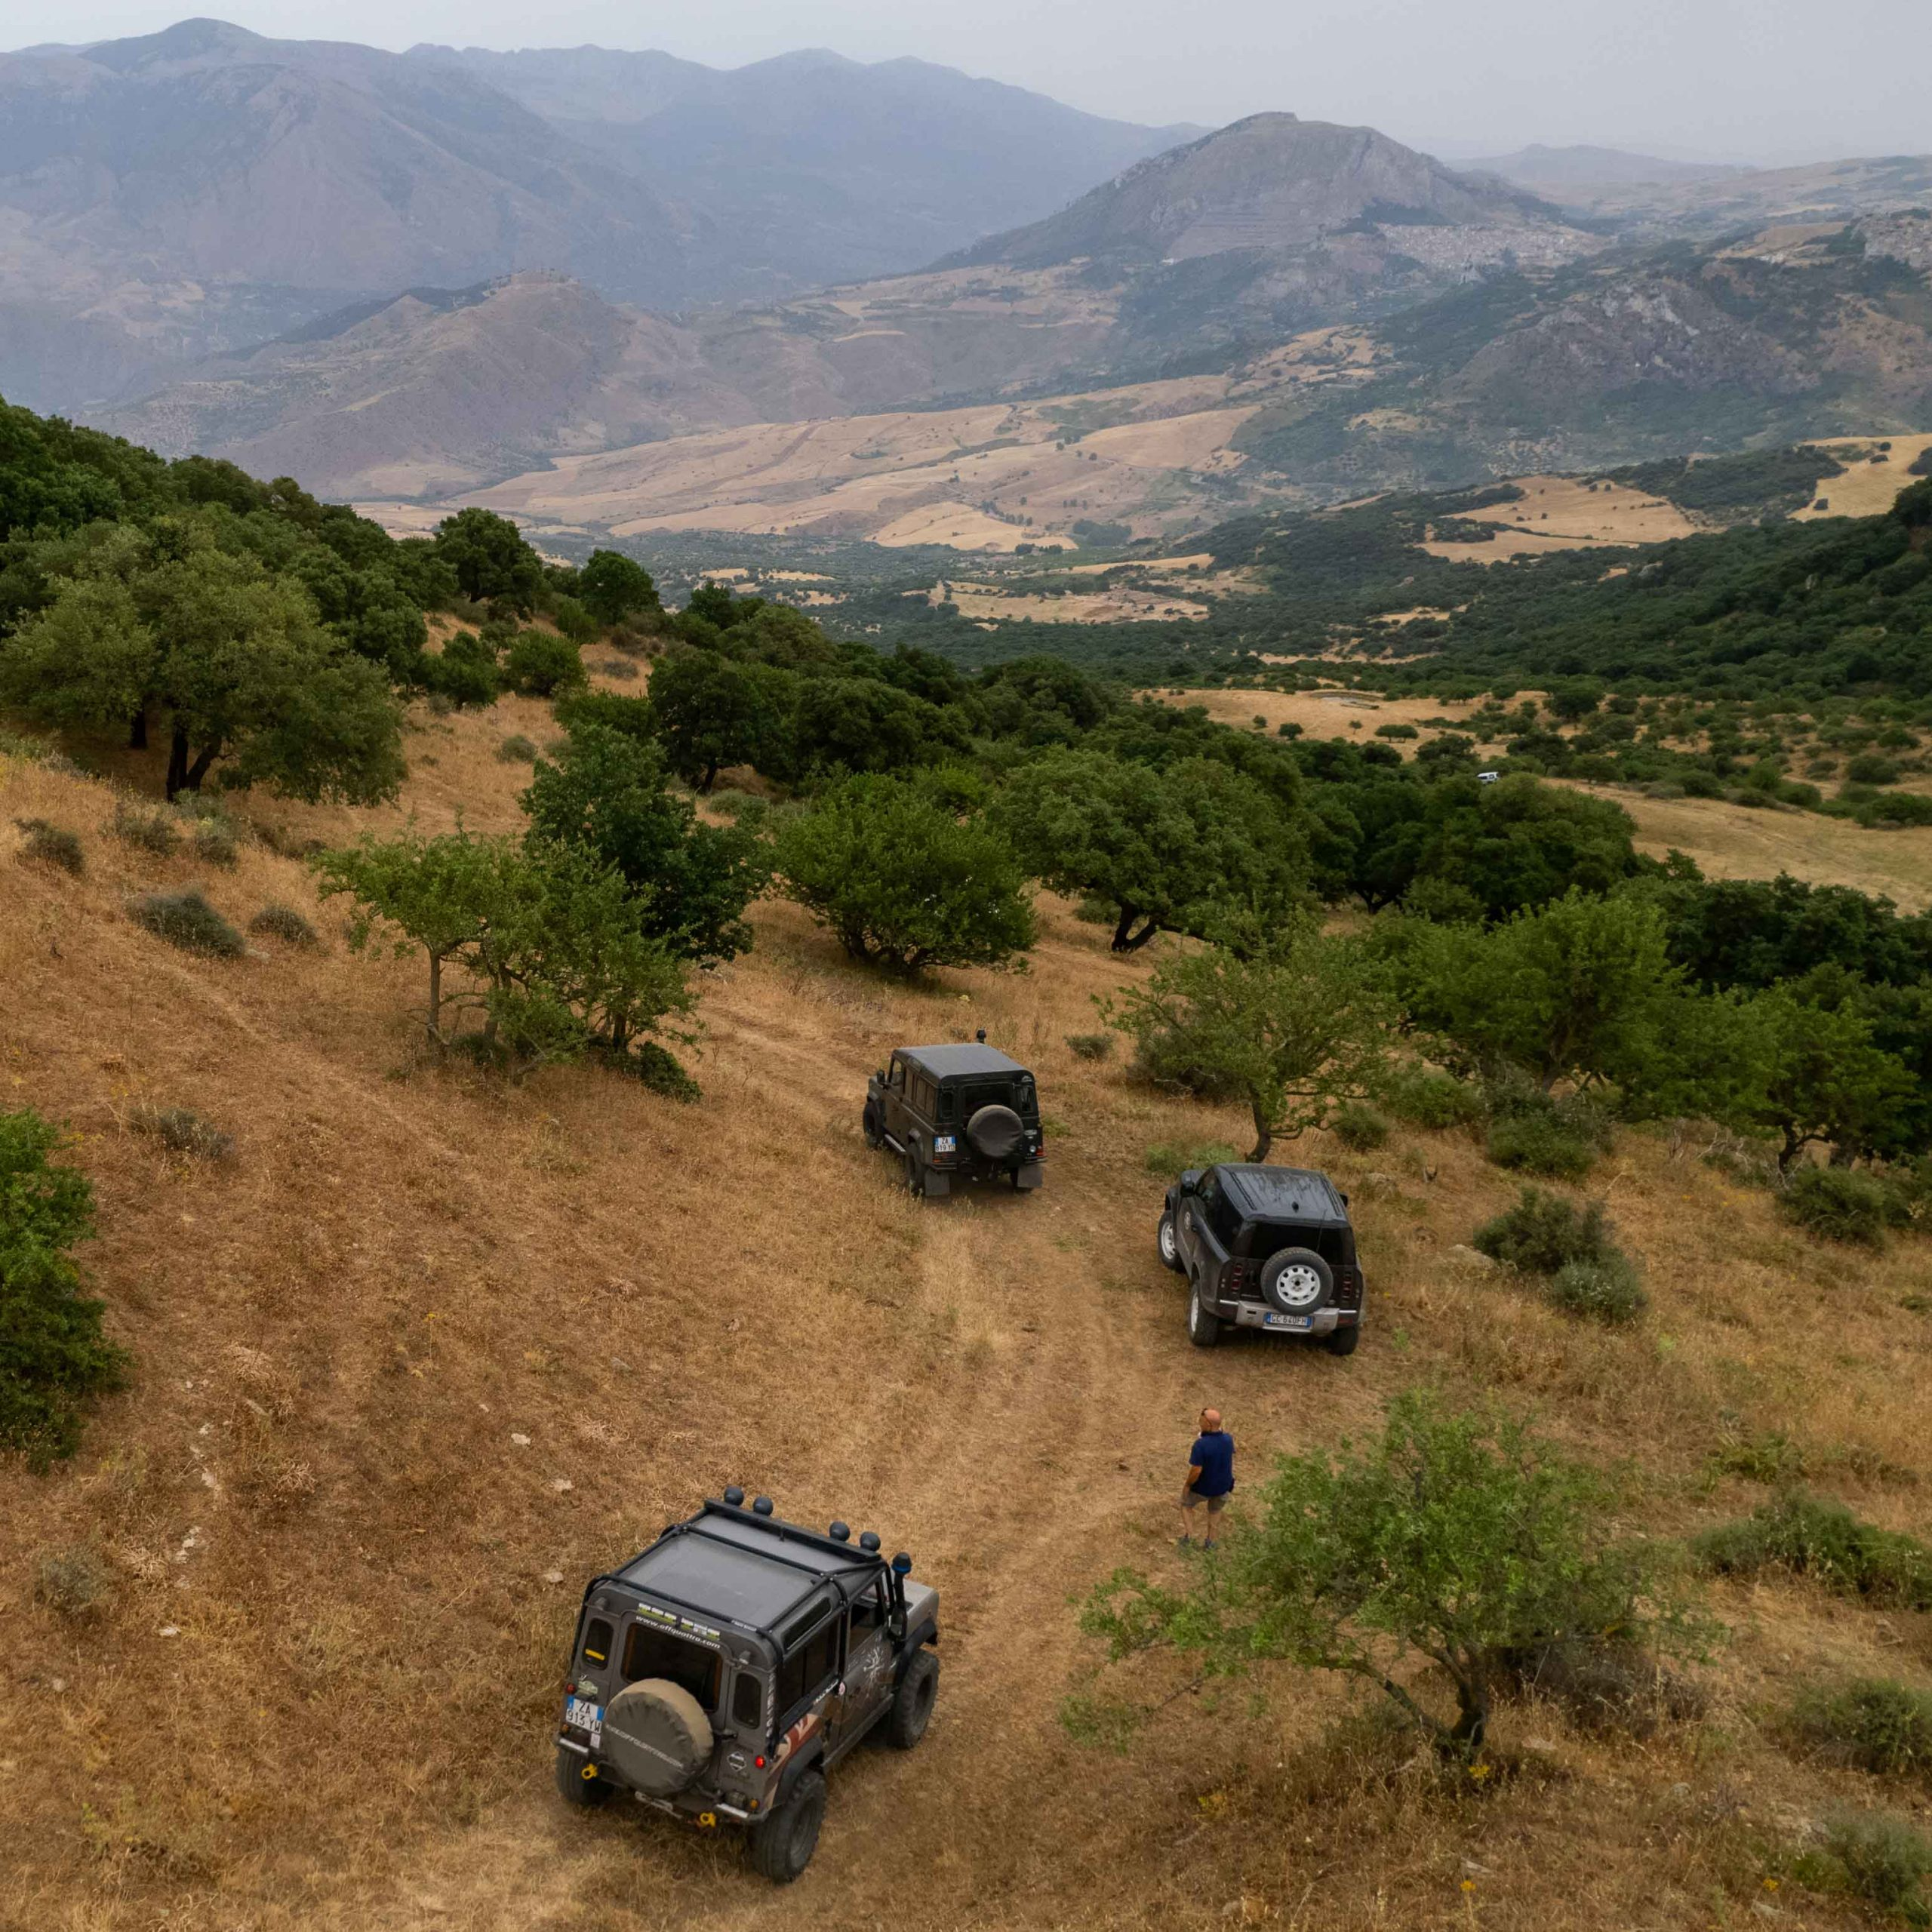 Land_Rover_Tour_Sicilia_2021_Land_Rover_Experience_Italia_-46